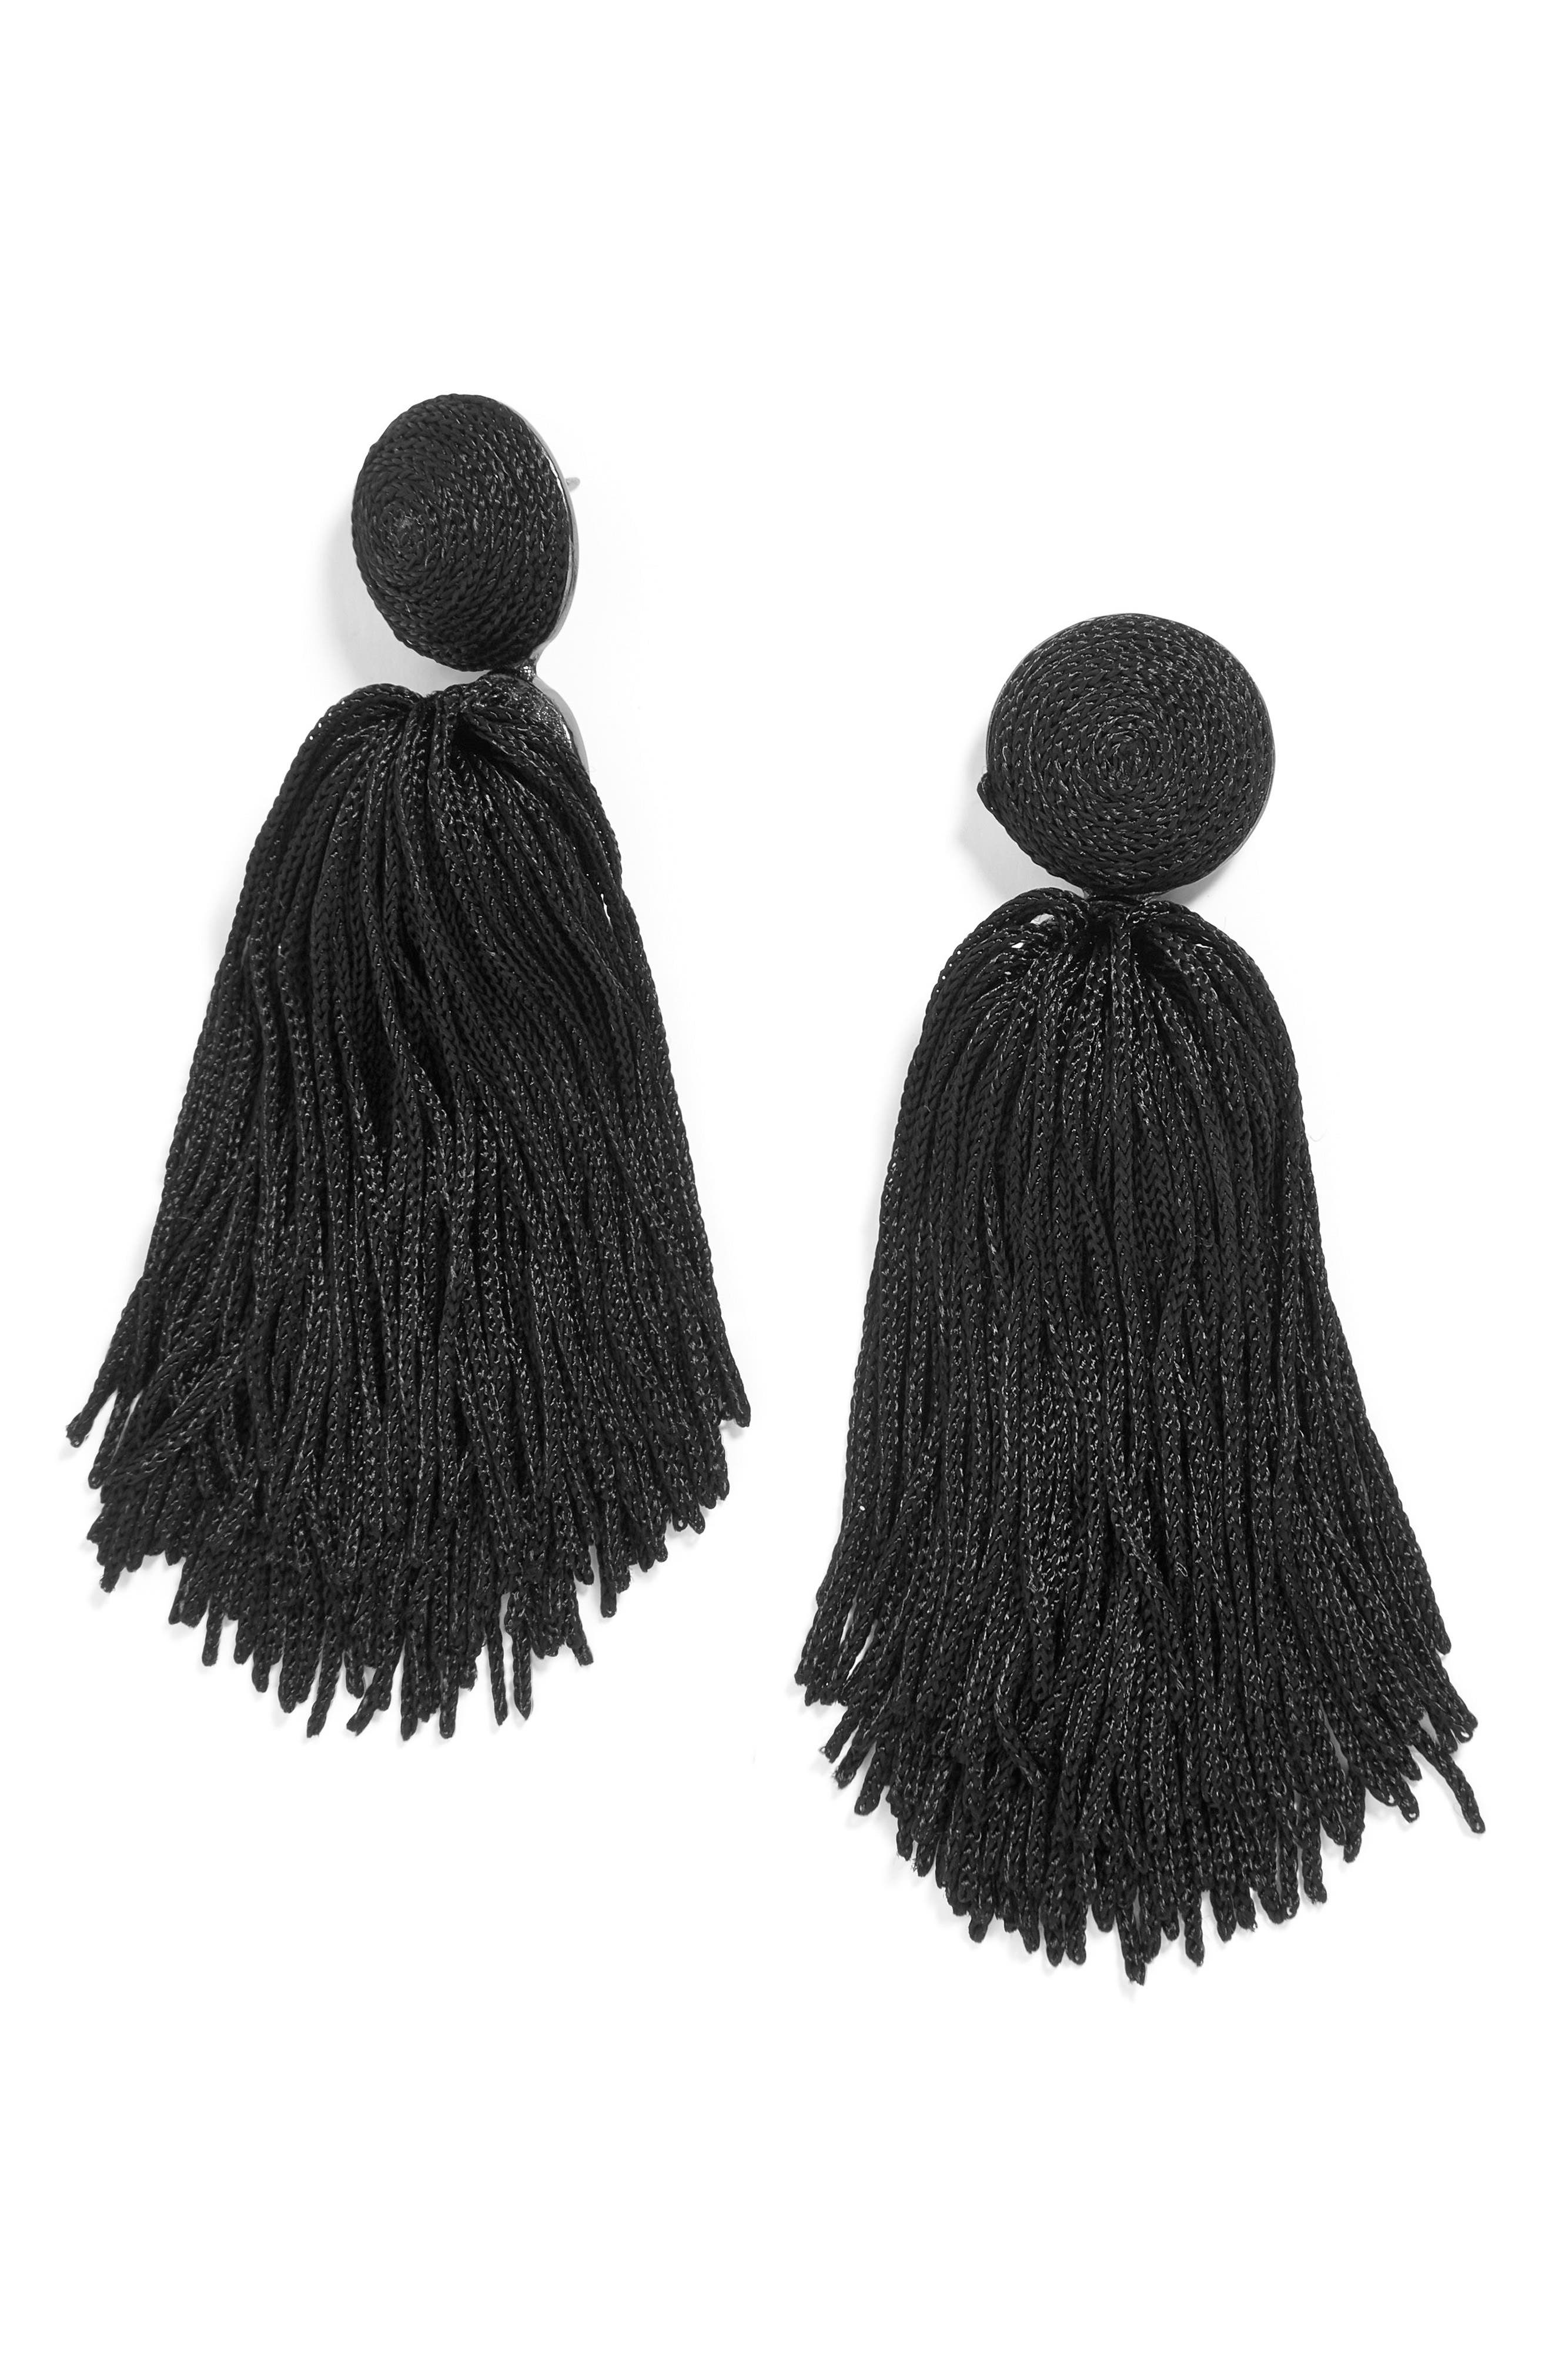 BAUBLEBAR Sonatina Tassel Earrings, Main, color, 001